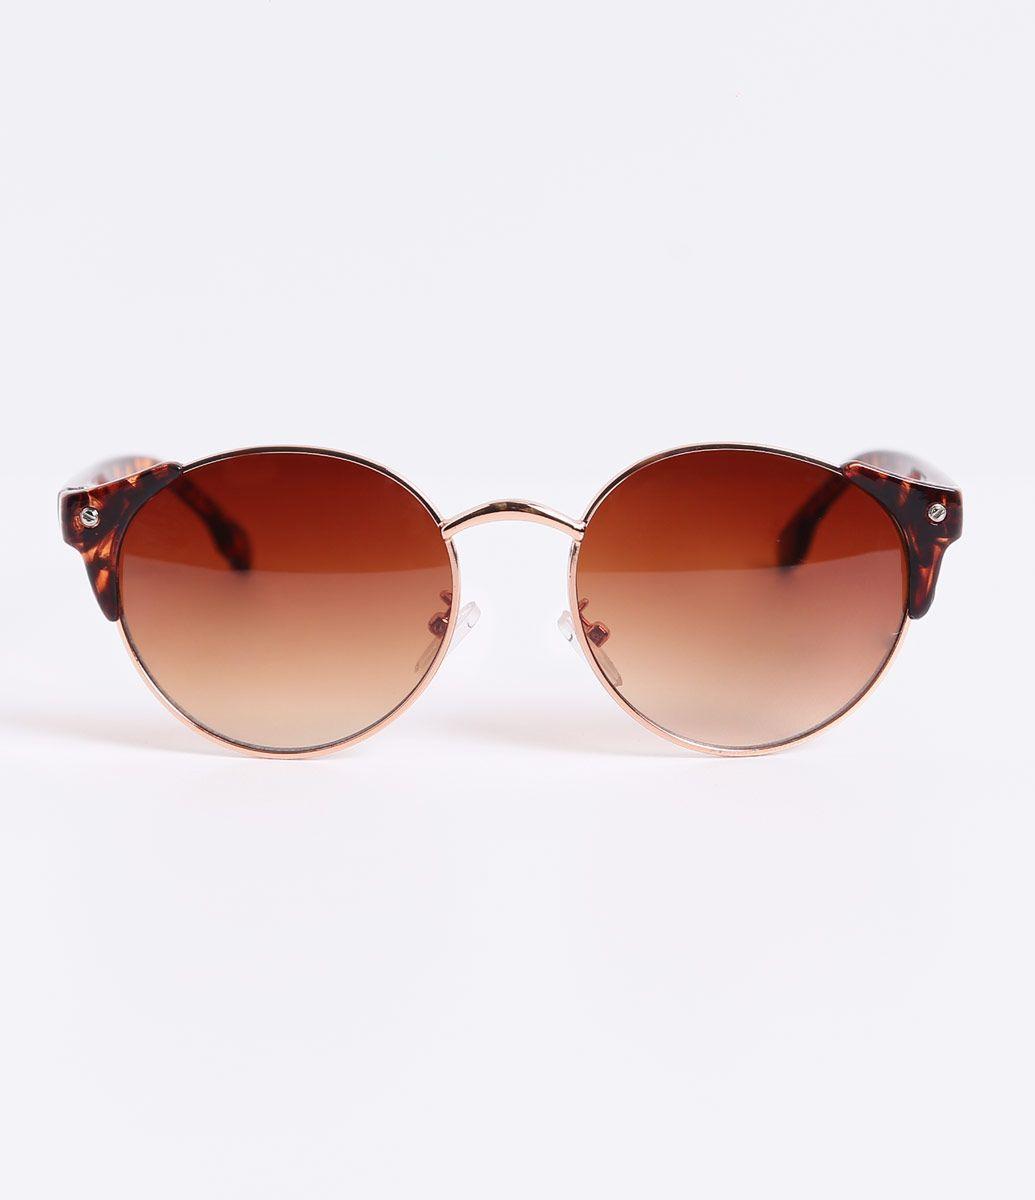 Óculos de Sol Feminino Redondo - Lojas Renner   fashion 15361b1752